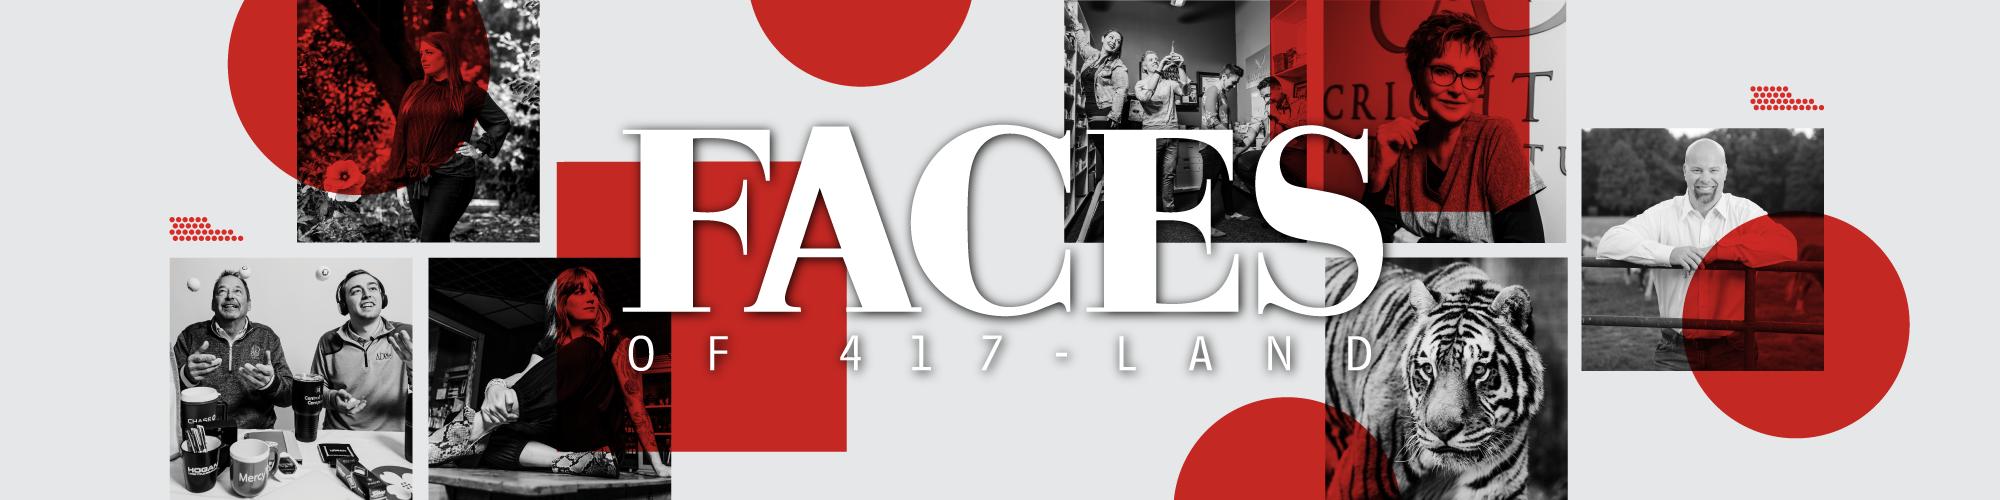 417 Magazine's Faces of 417-Land